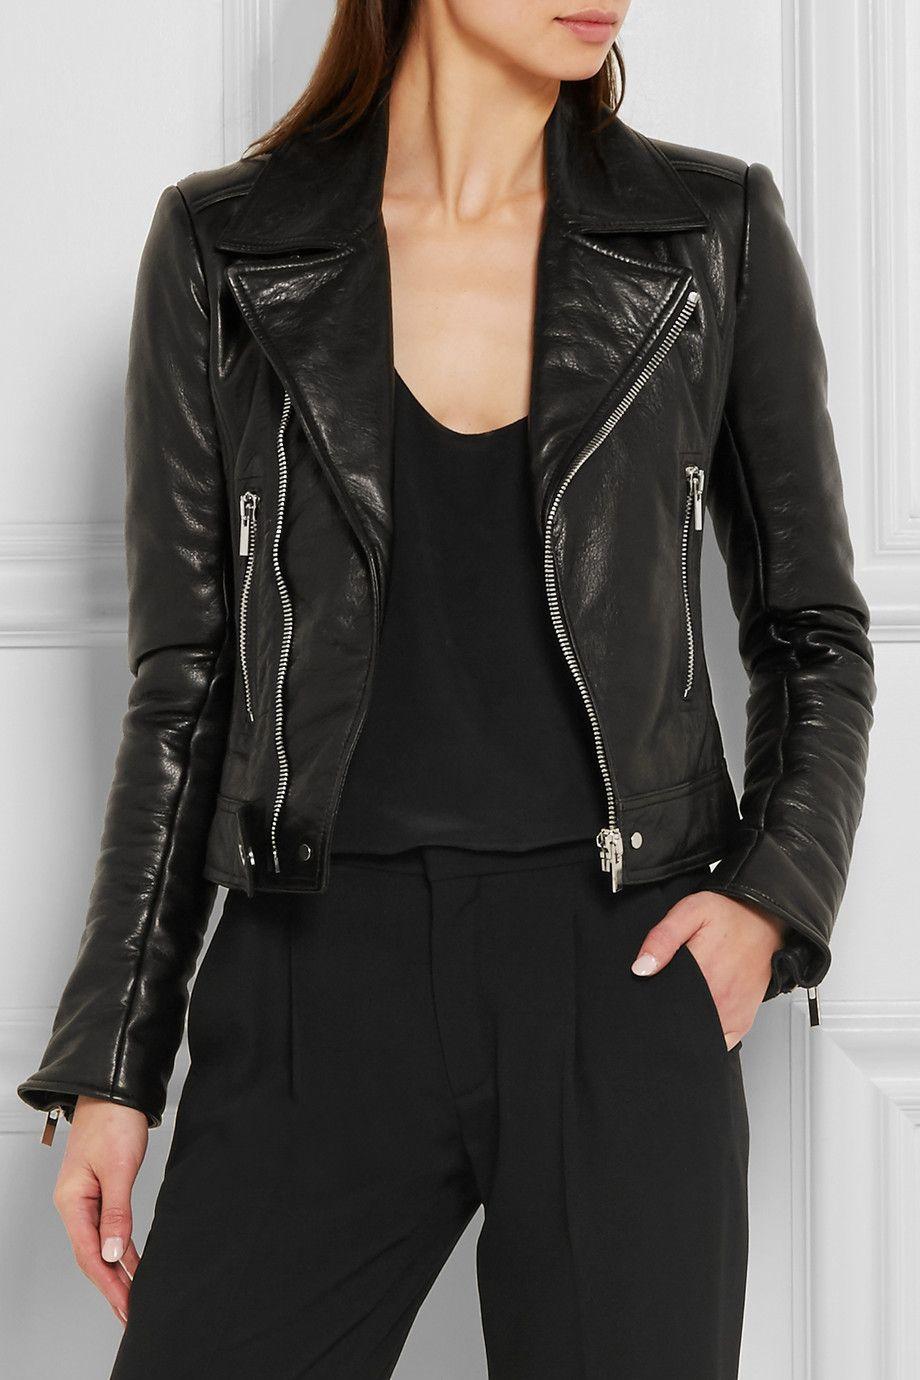 énorme réduction 70b1c 8ed16 Balenciaga | Perfecto en cuir | NET-A-PORTER.COM | Black ...